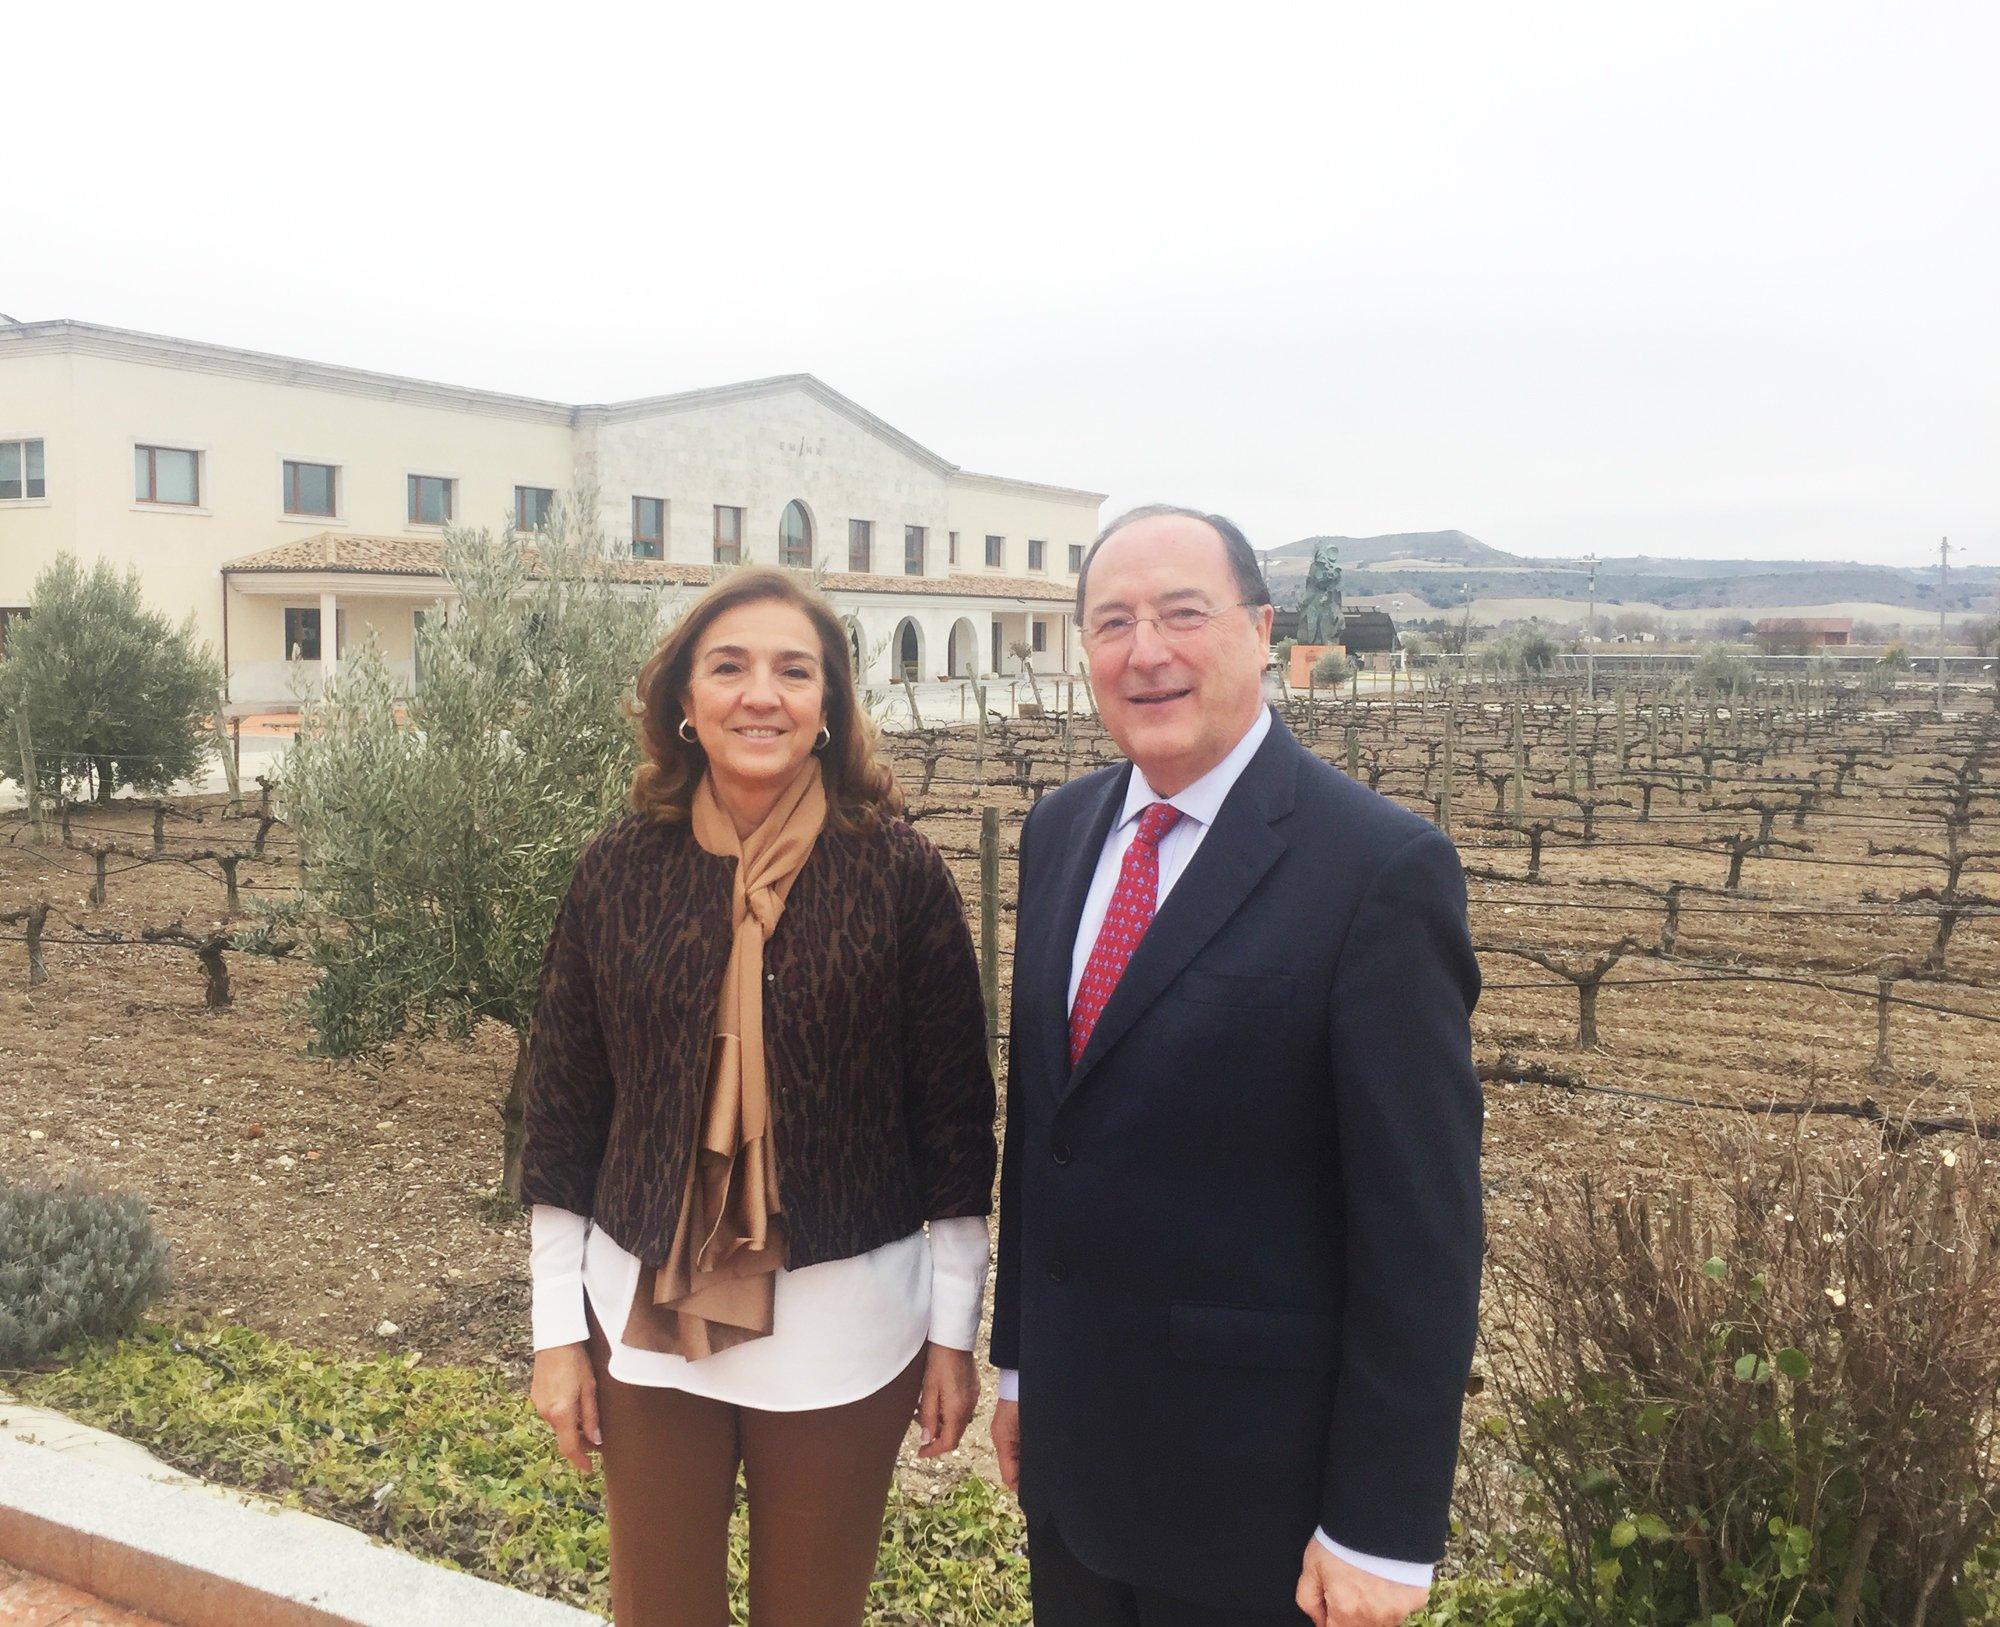 Carmen Vela elogia el permanente esfuerzo innovador de pymes como Matarromera